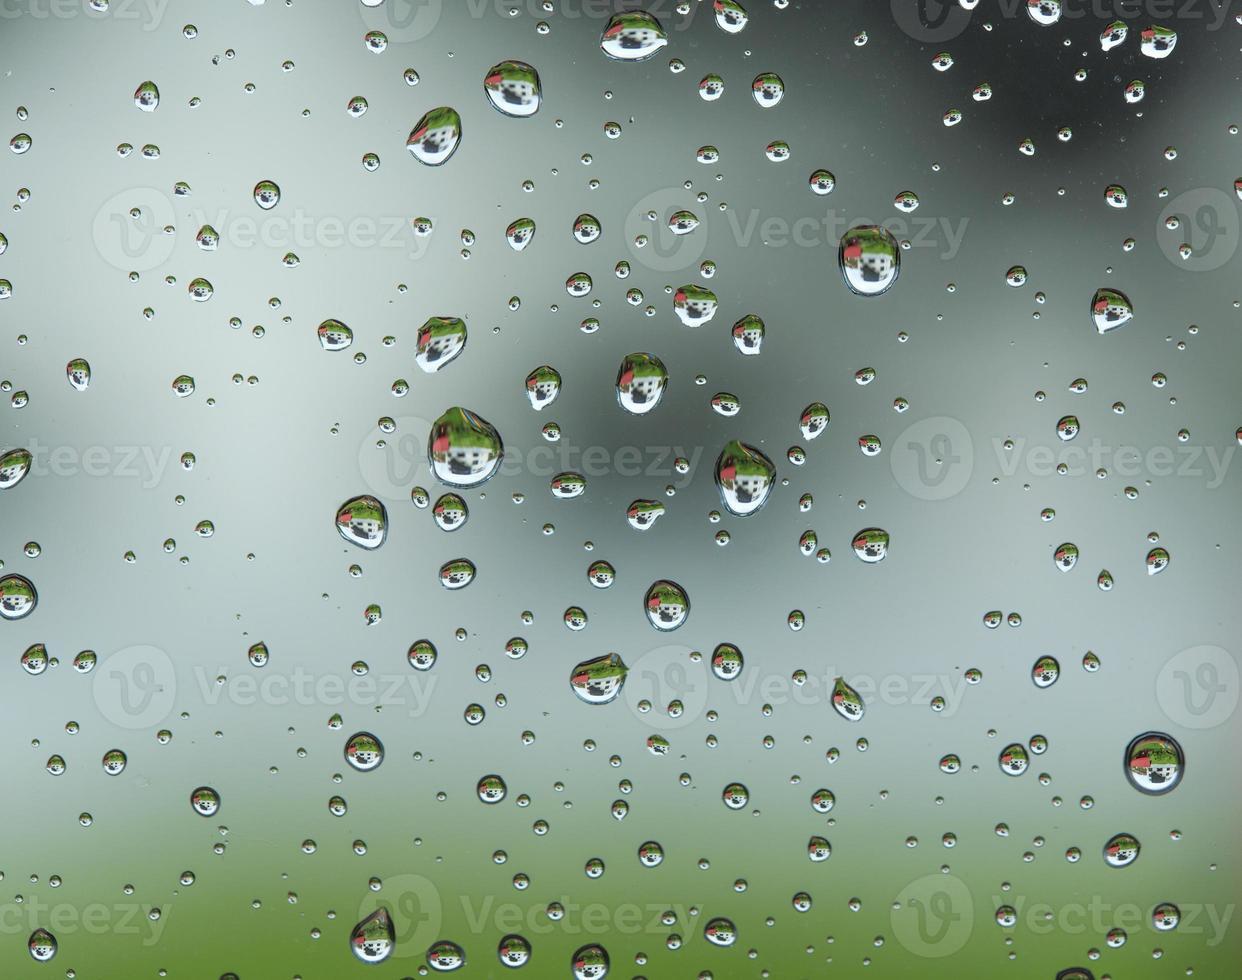 Raindrop patterns photo